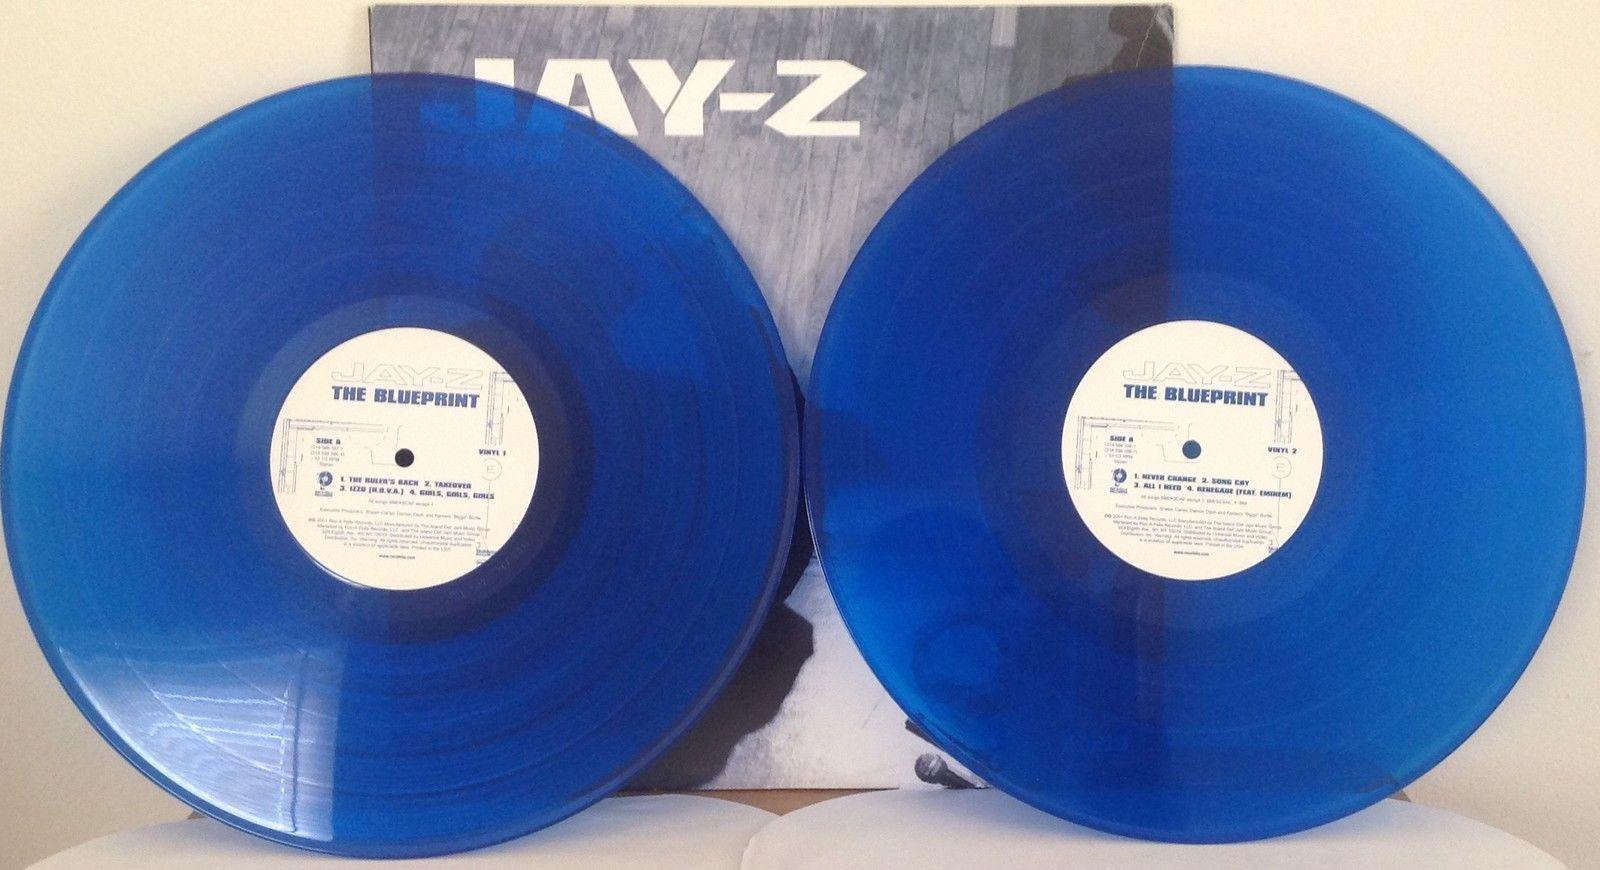 Jay z the blueprint original promo blue vinyl 2 lp 2001 rocafella jay z the blueprint original promo blue vinyl 2 lp 2001 rocafella records kanye malvernweather Image collections